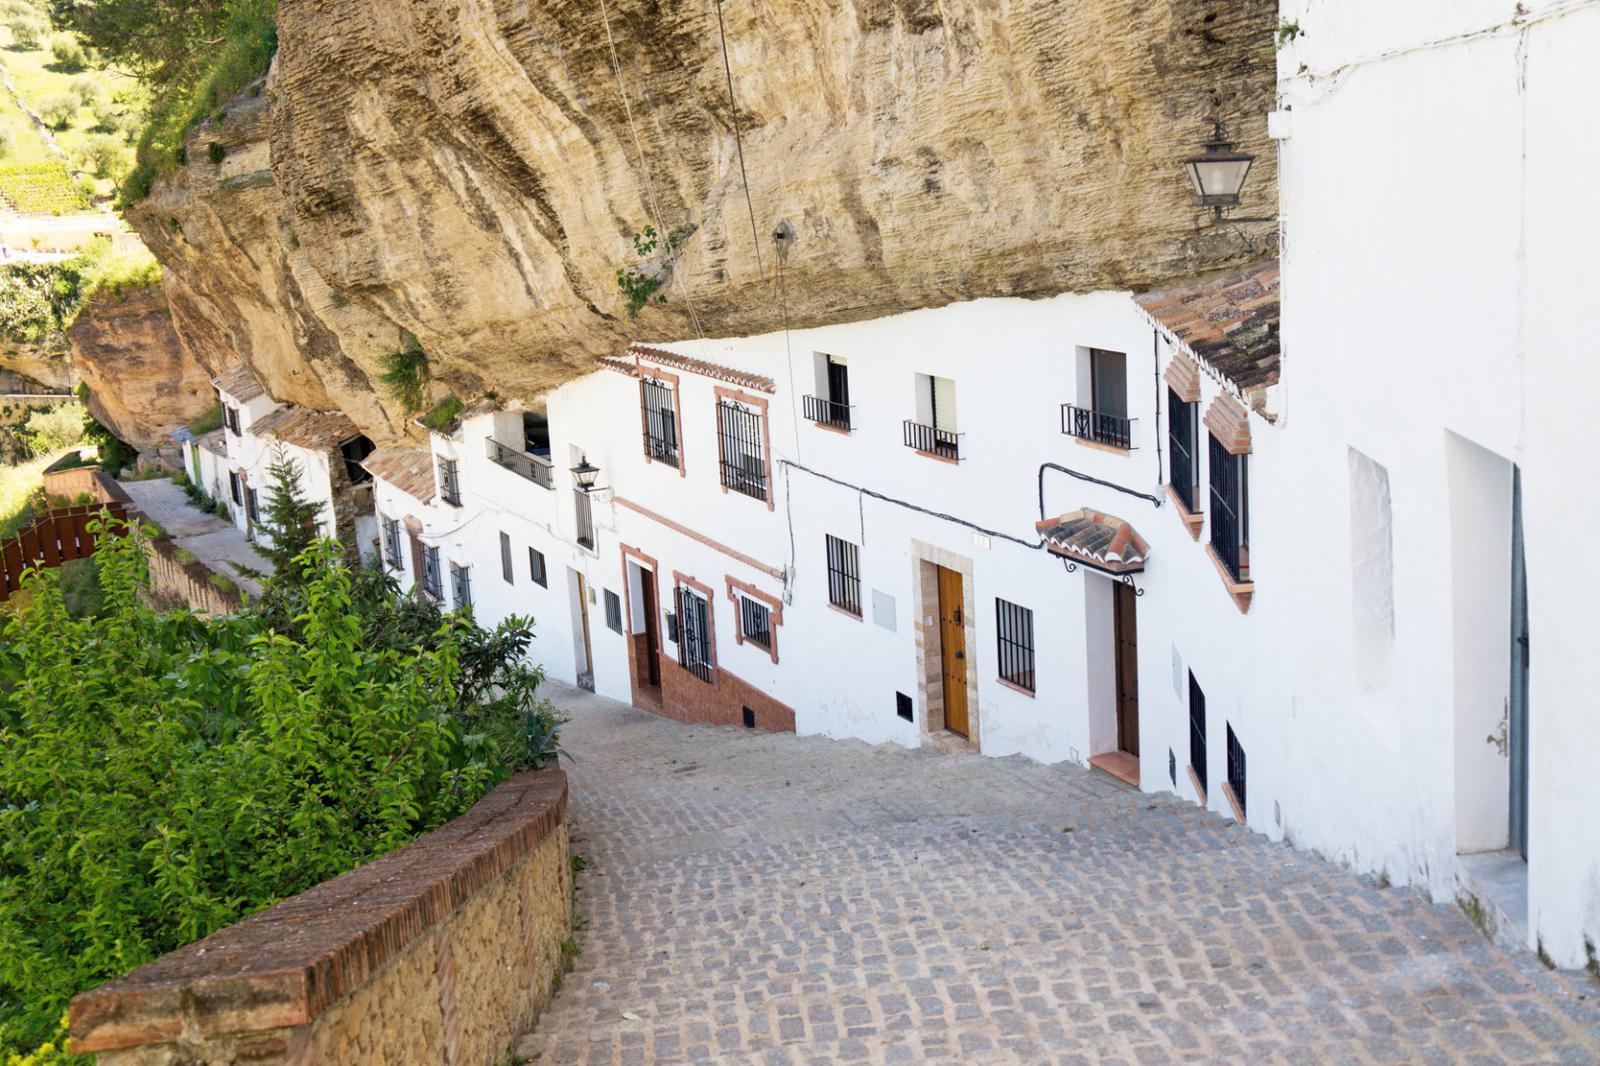 pueblos andaluces con encanto Calle Calacetas, Setenil